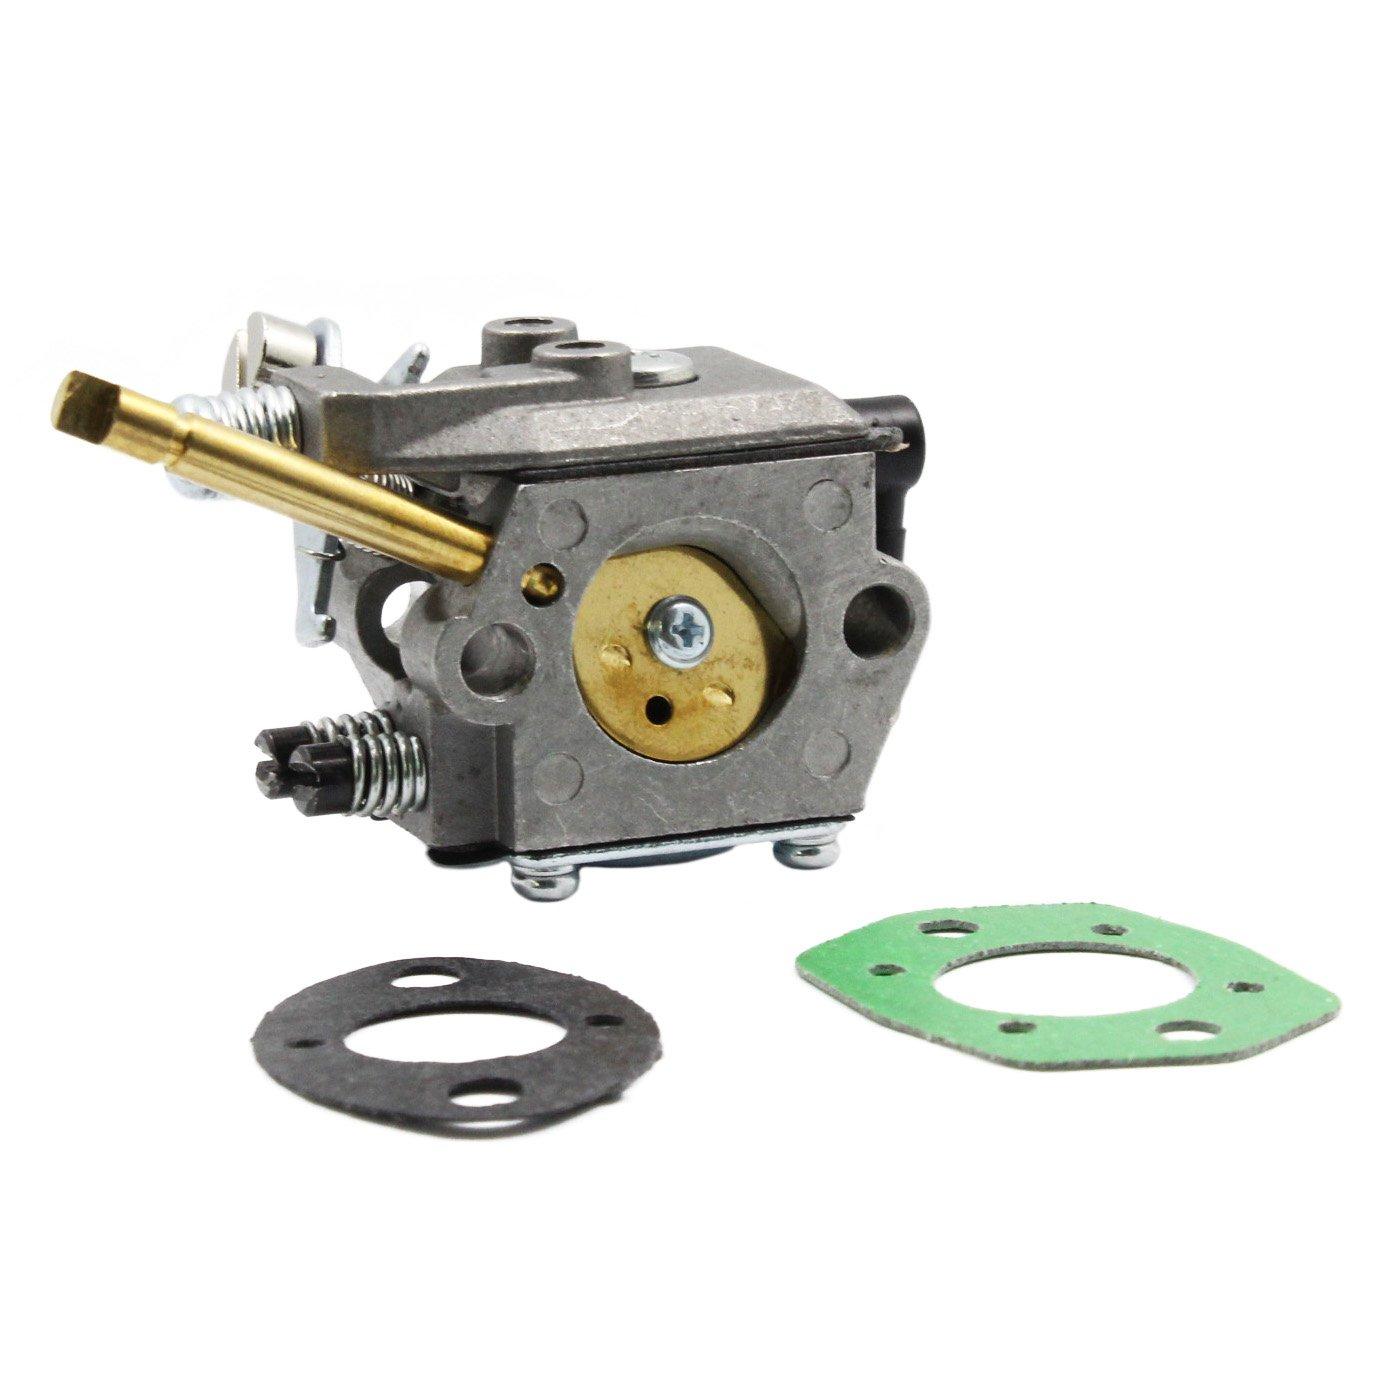 Stens 615-554 OEM Carburetor Kit//Walbro K10-WZ